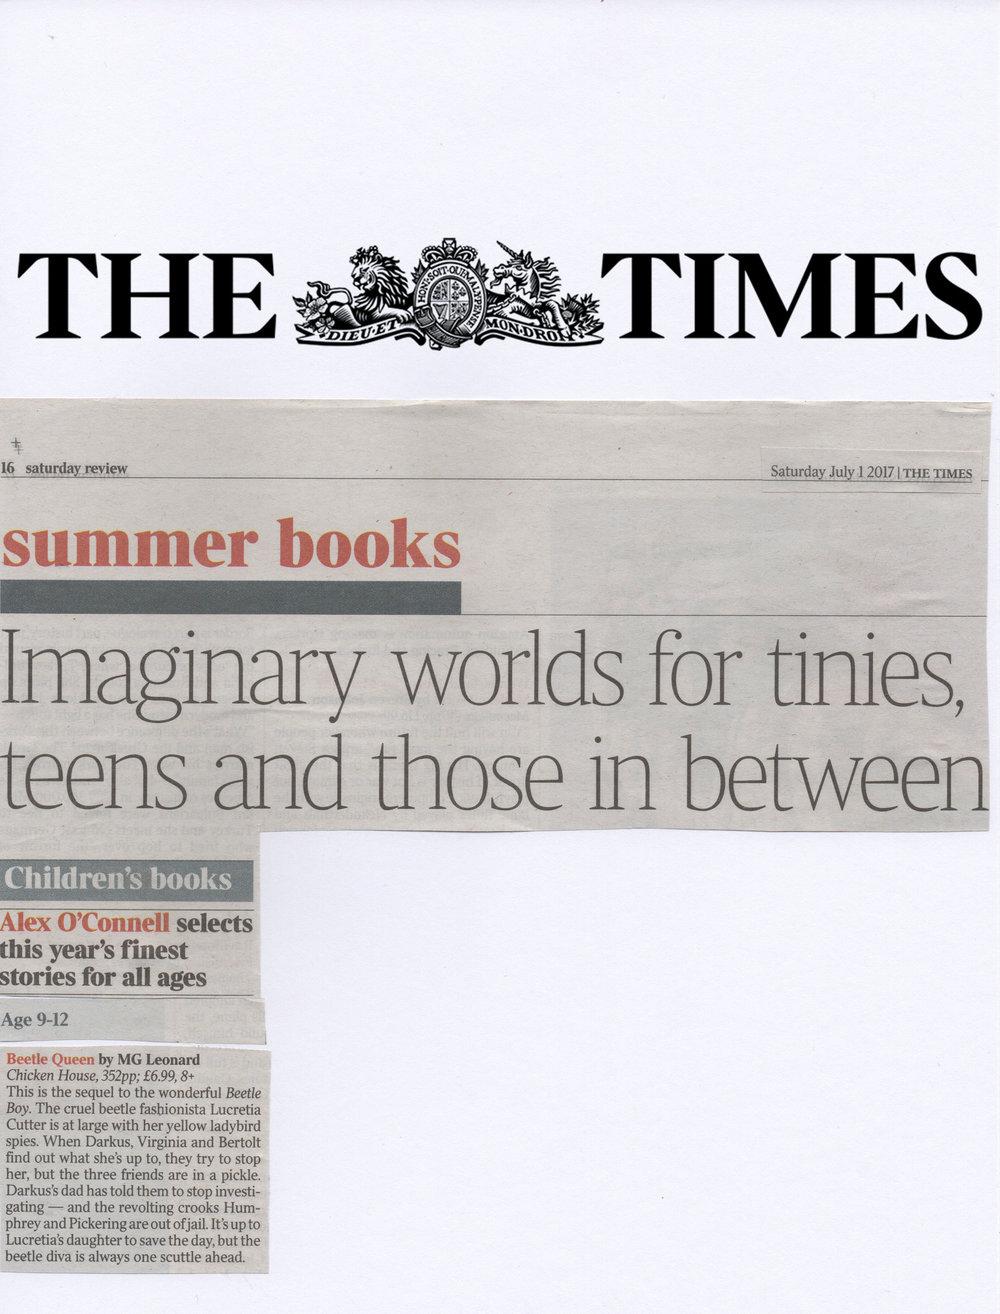 TimesSummerBooks2017.jpg